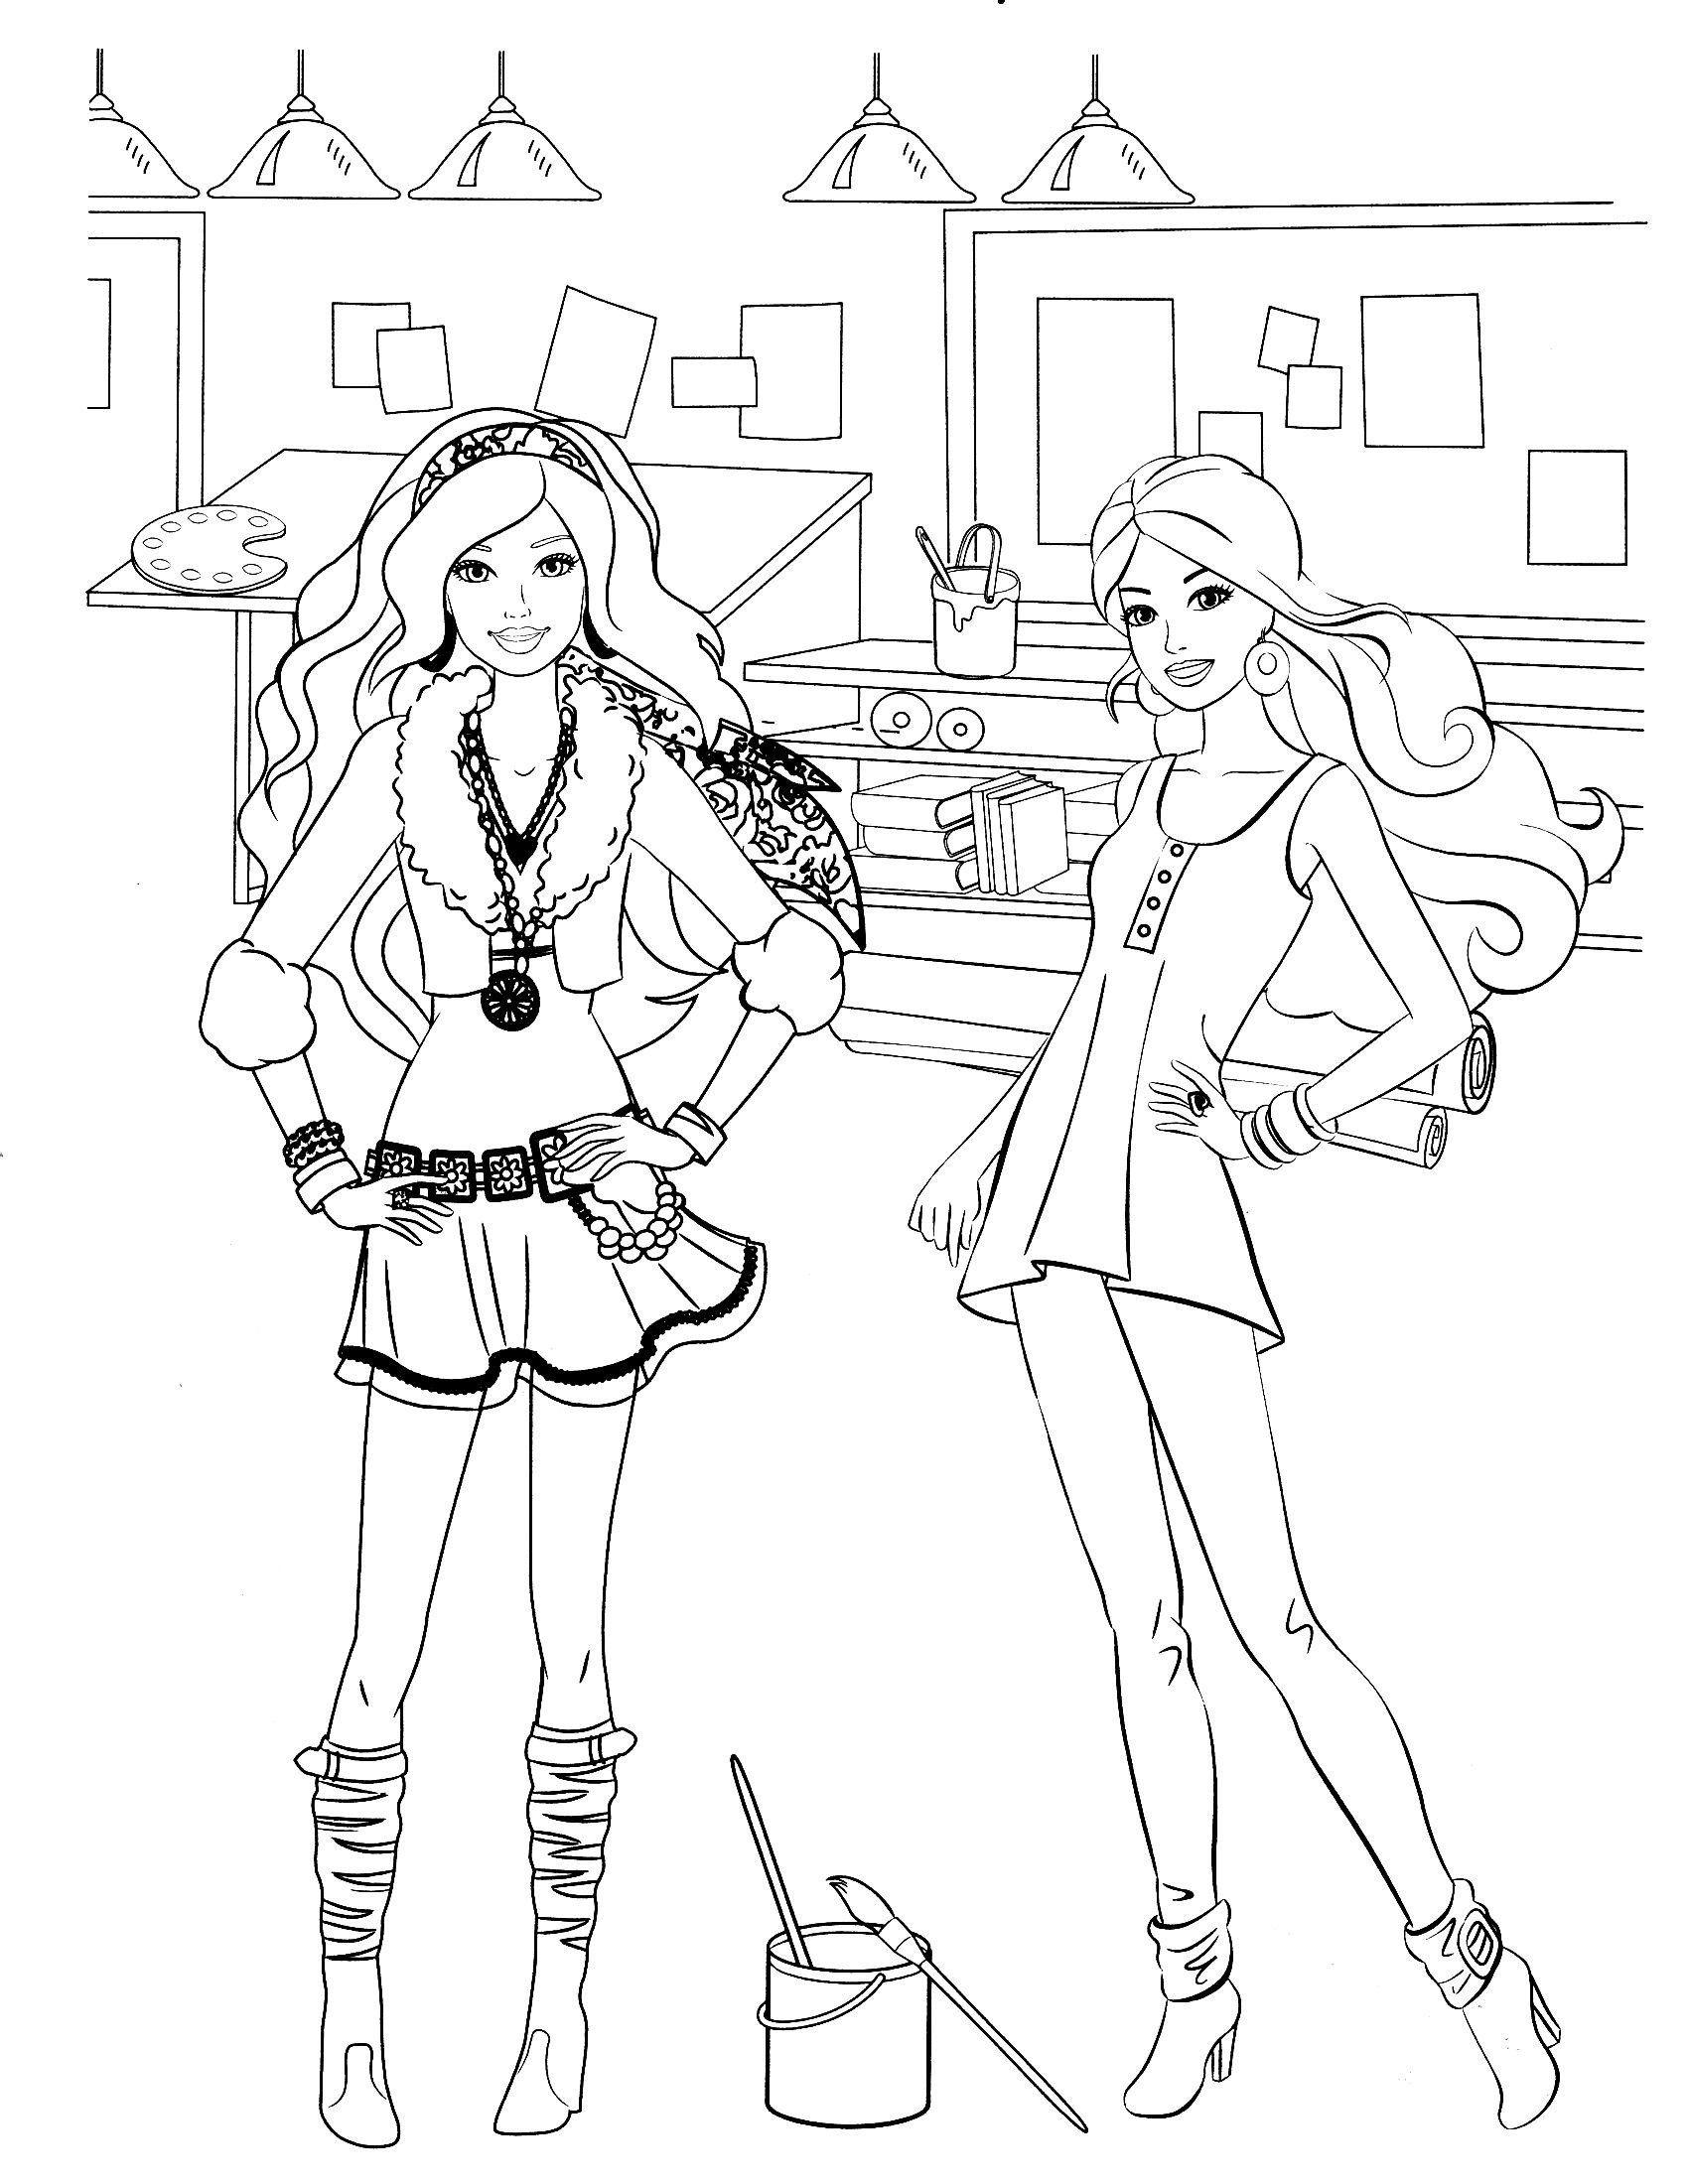 Barbie Chelsea Coloring Pages Barbie Coloring Page With Images In 2020 Barbie Coloring Pages Barbie Coloring Cartoon Coloring Pages